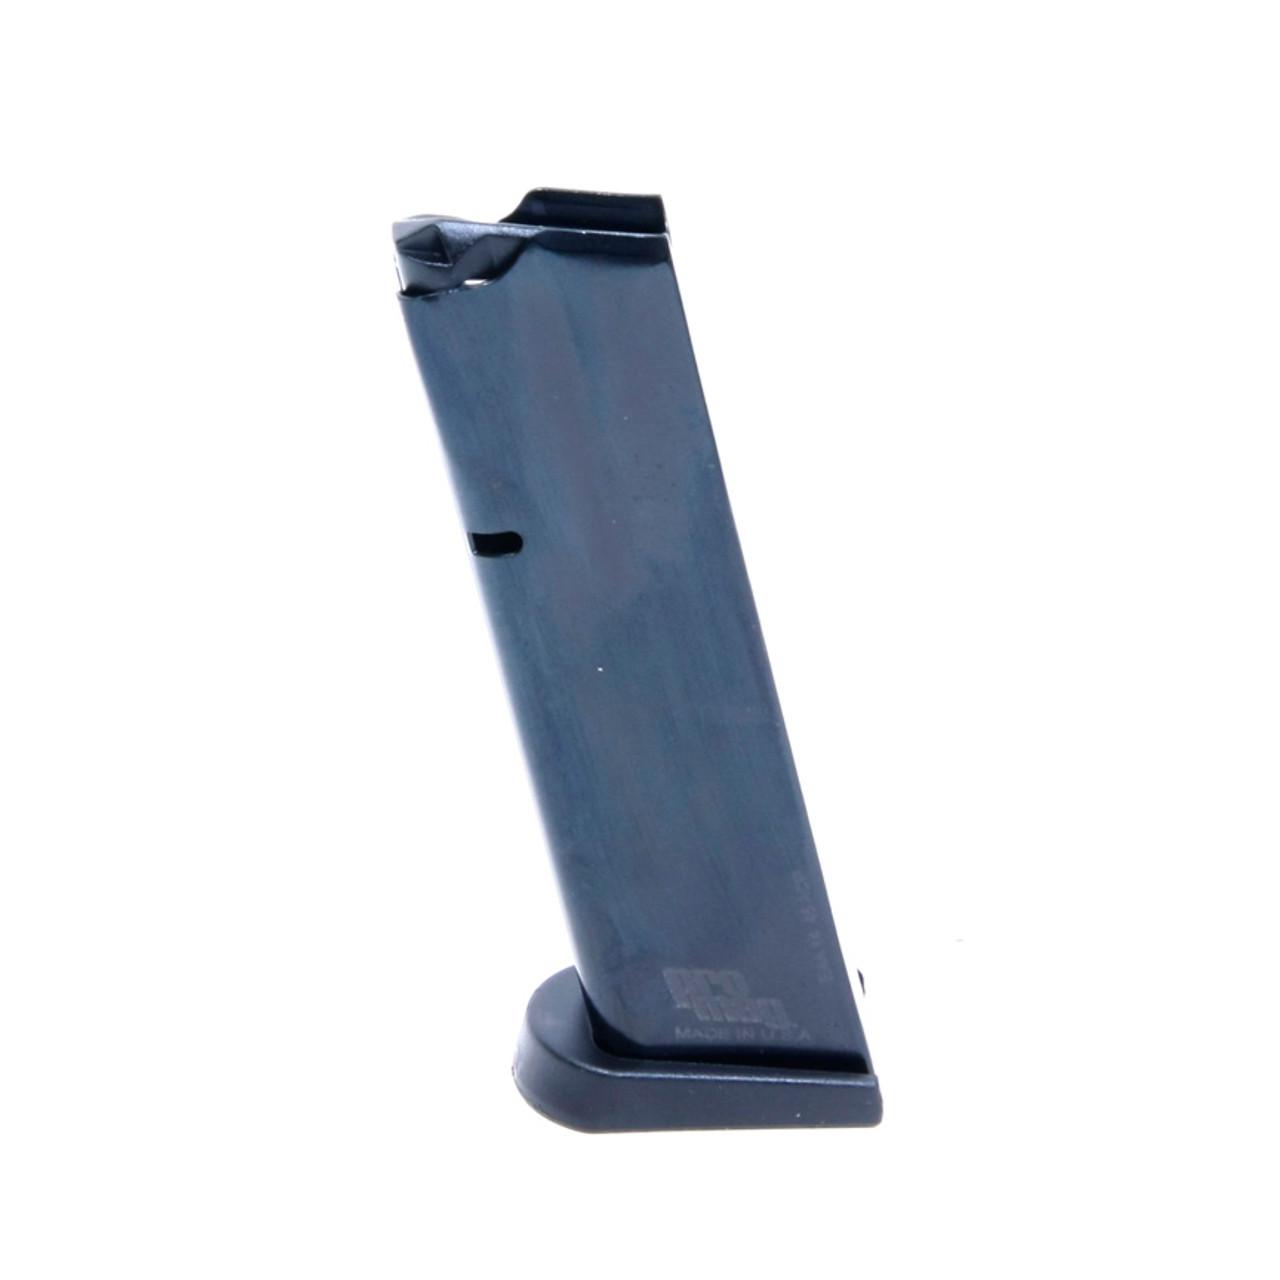 EAA Corp® Witness® .45 ACP (10) Rd - Blue Steel